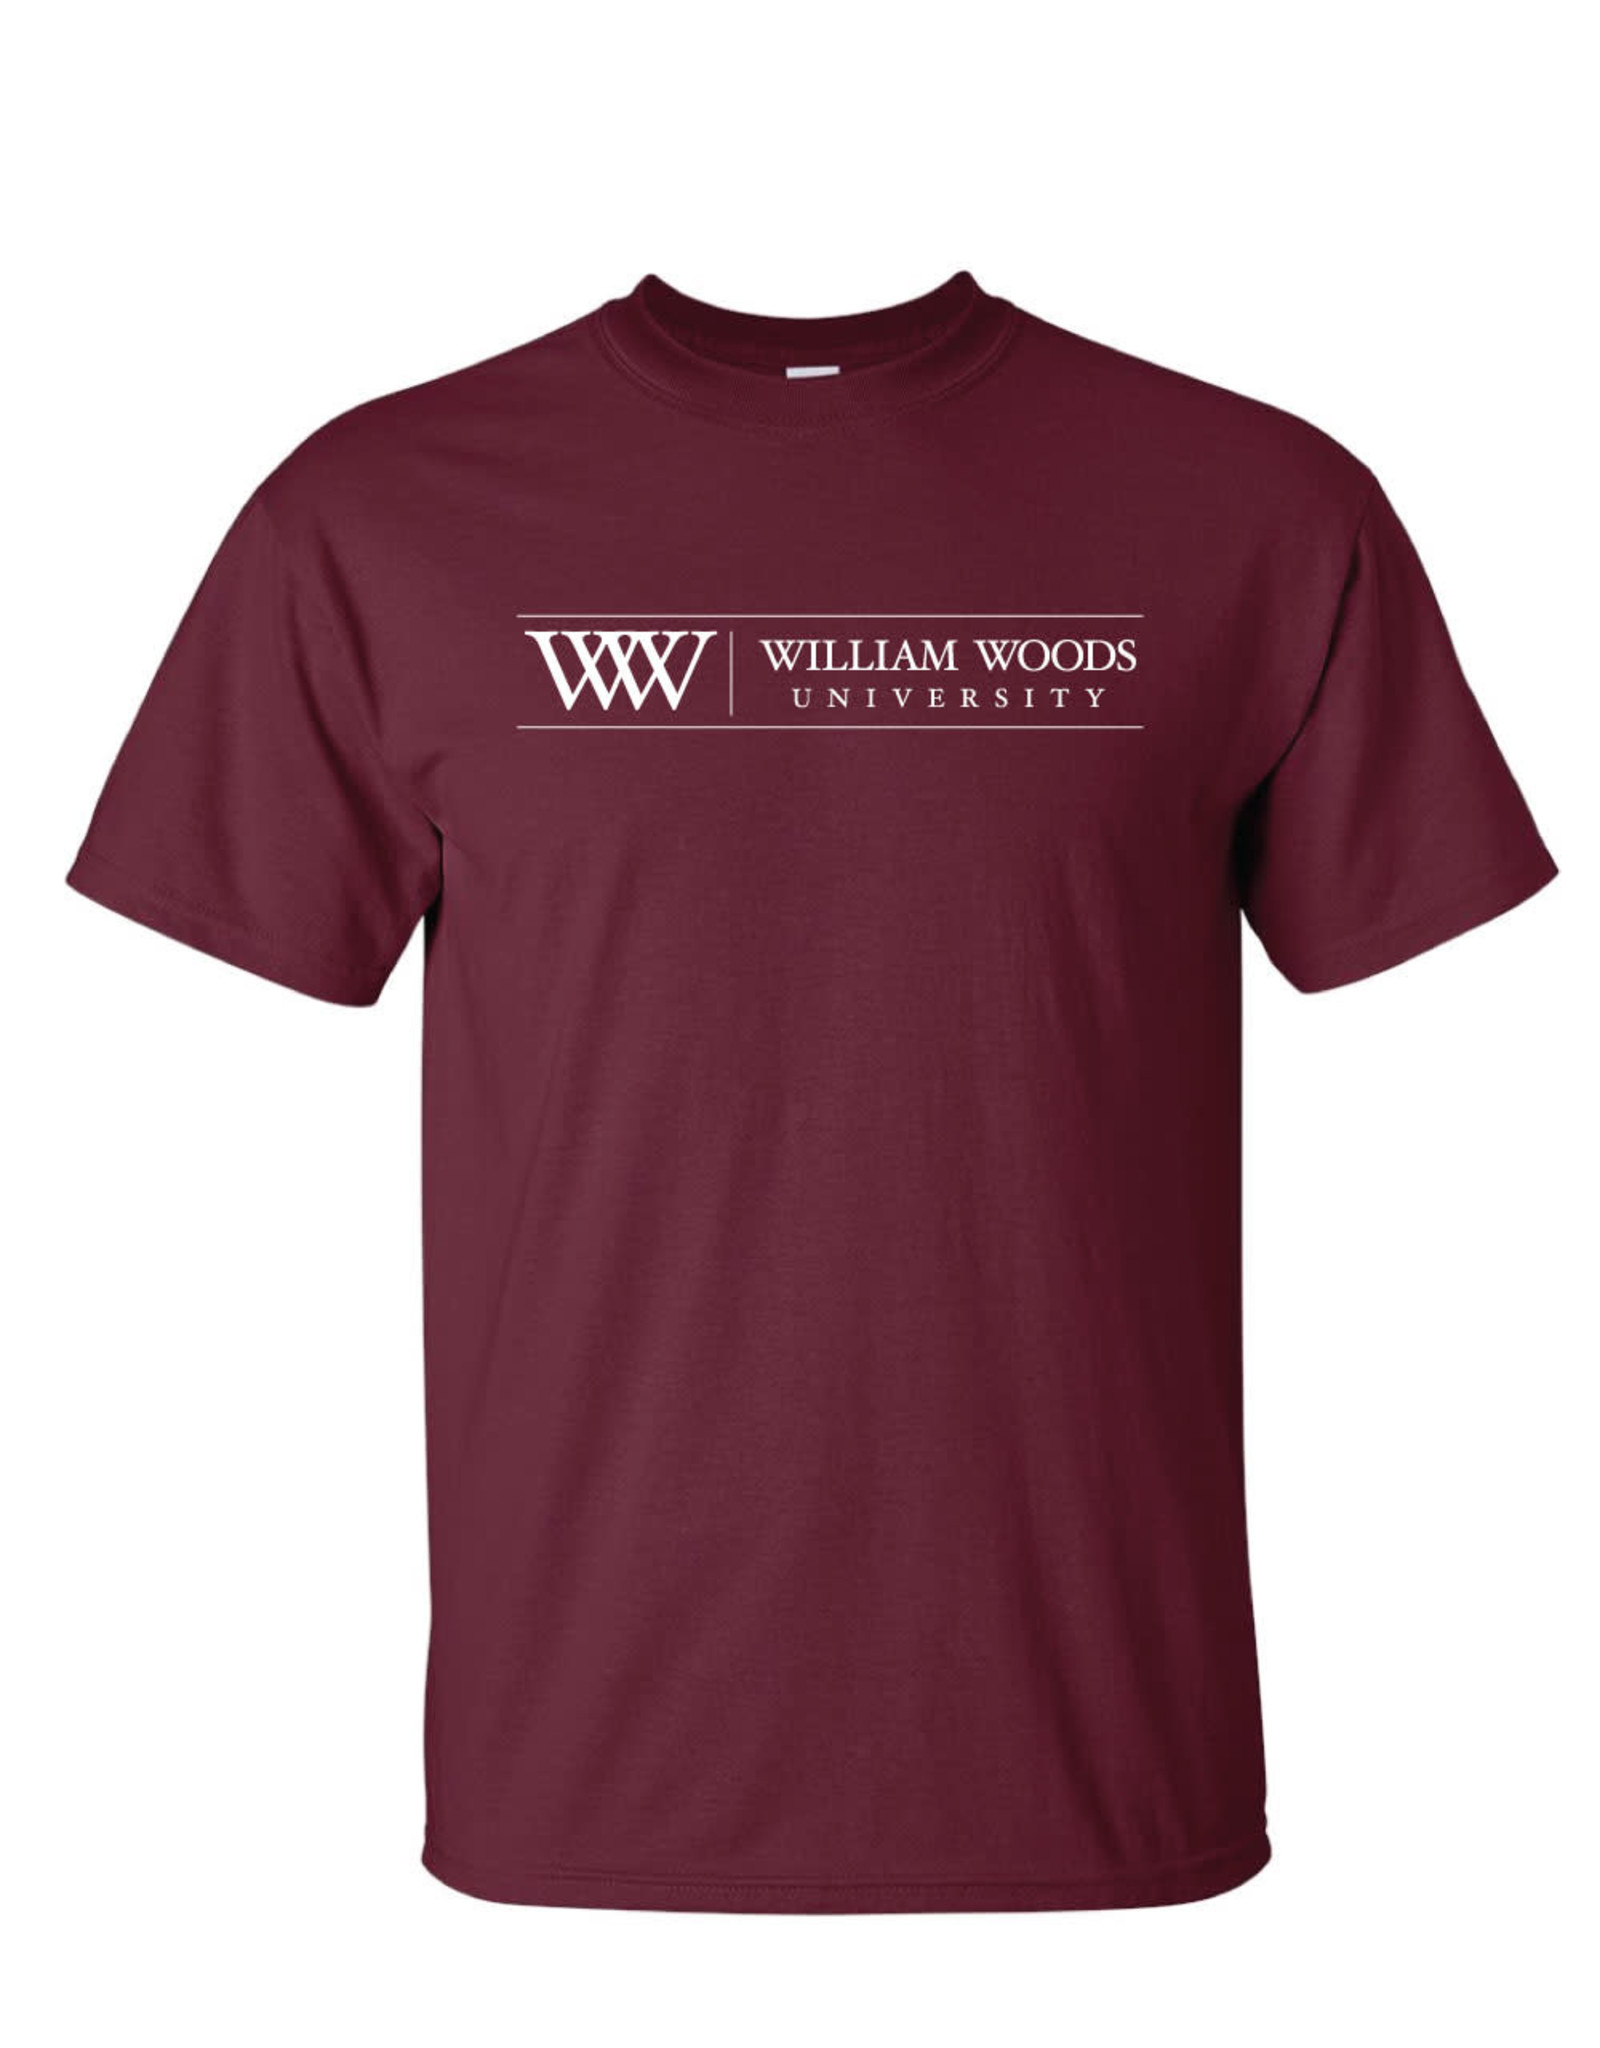 WW William Woods University Short Sleeve Gildan Tee